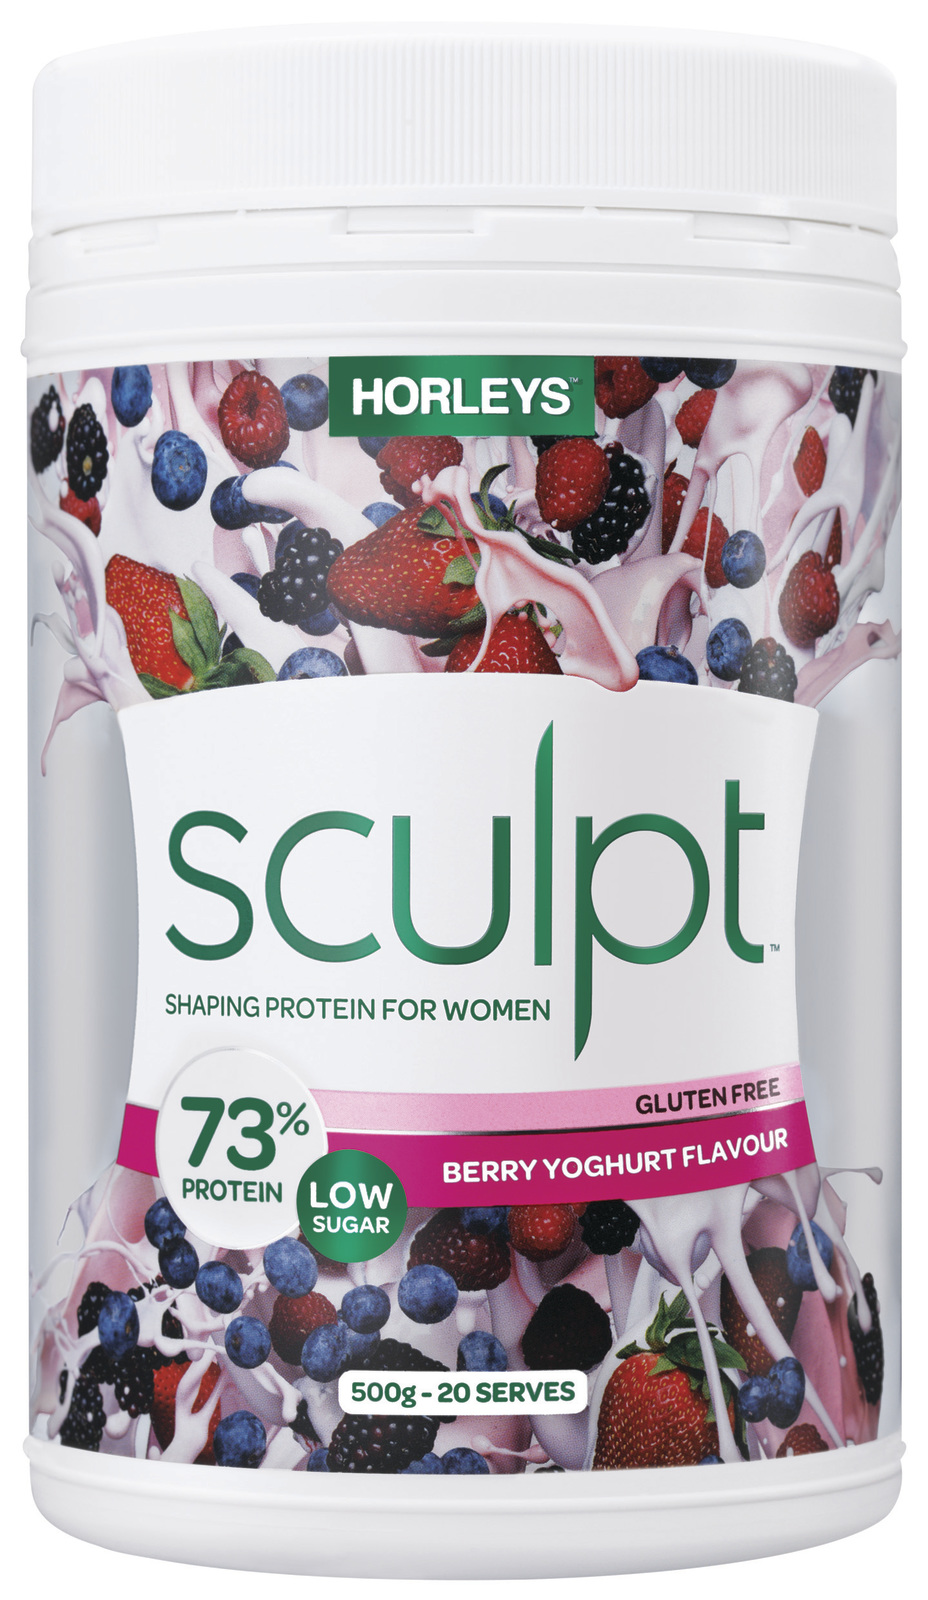 Horleys Sculpt Protein Powder - Summer Berries (500g) image